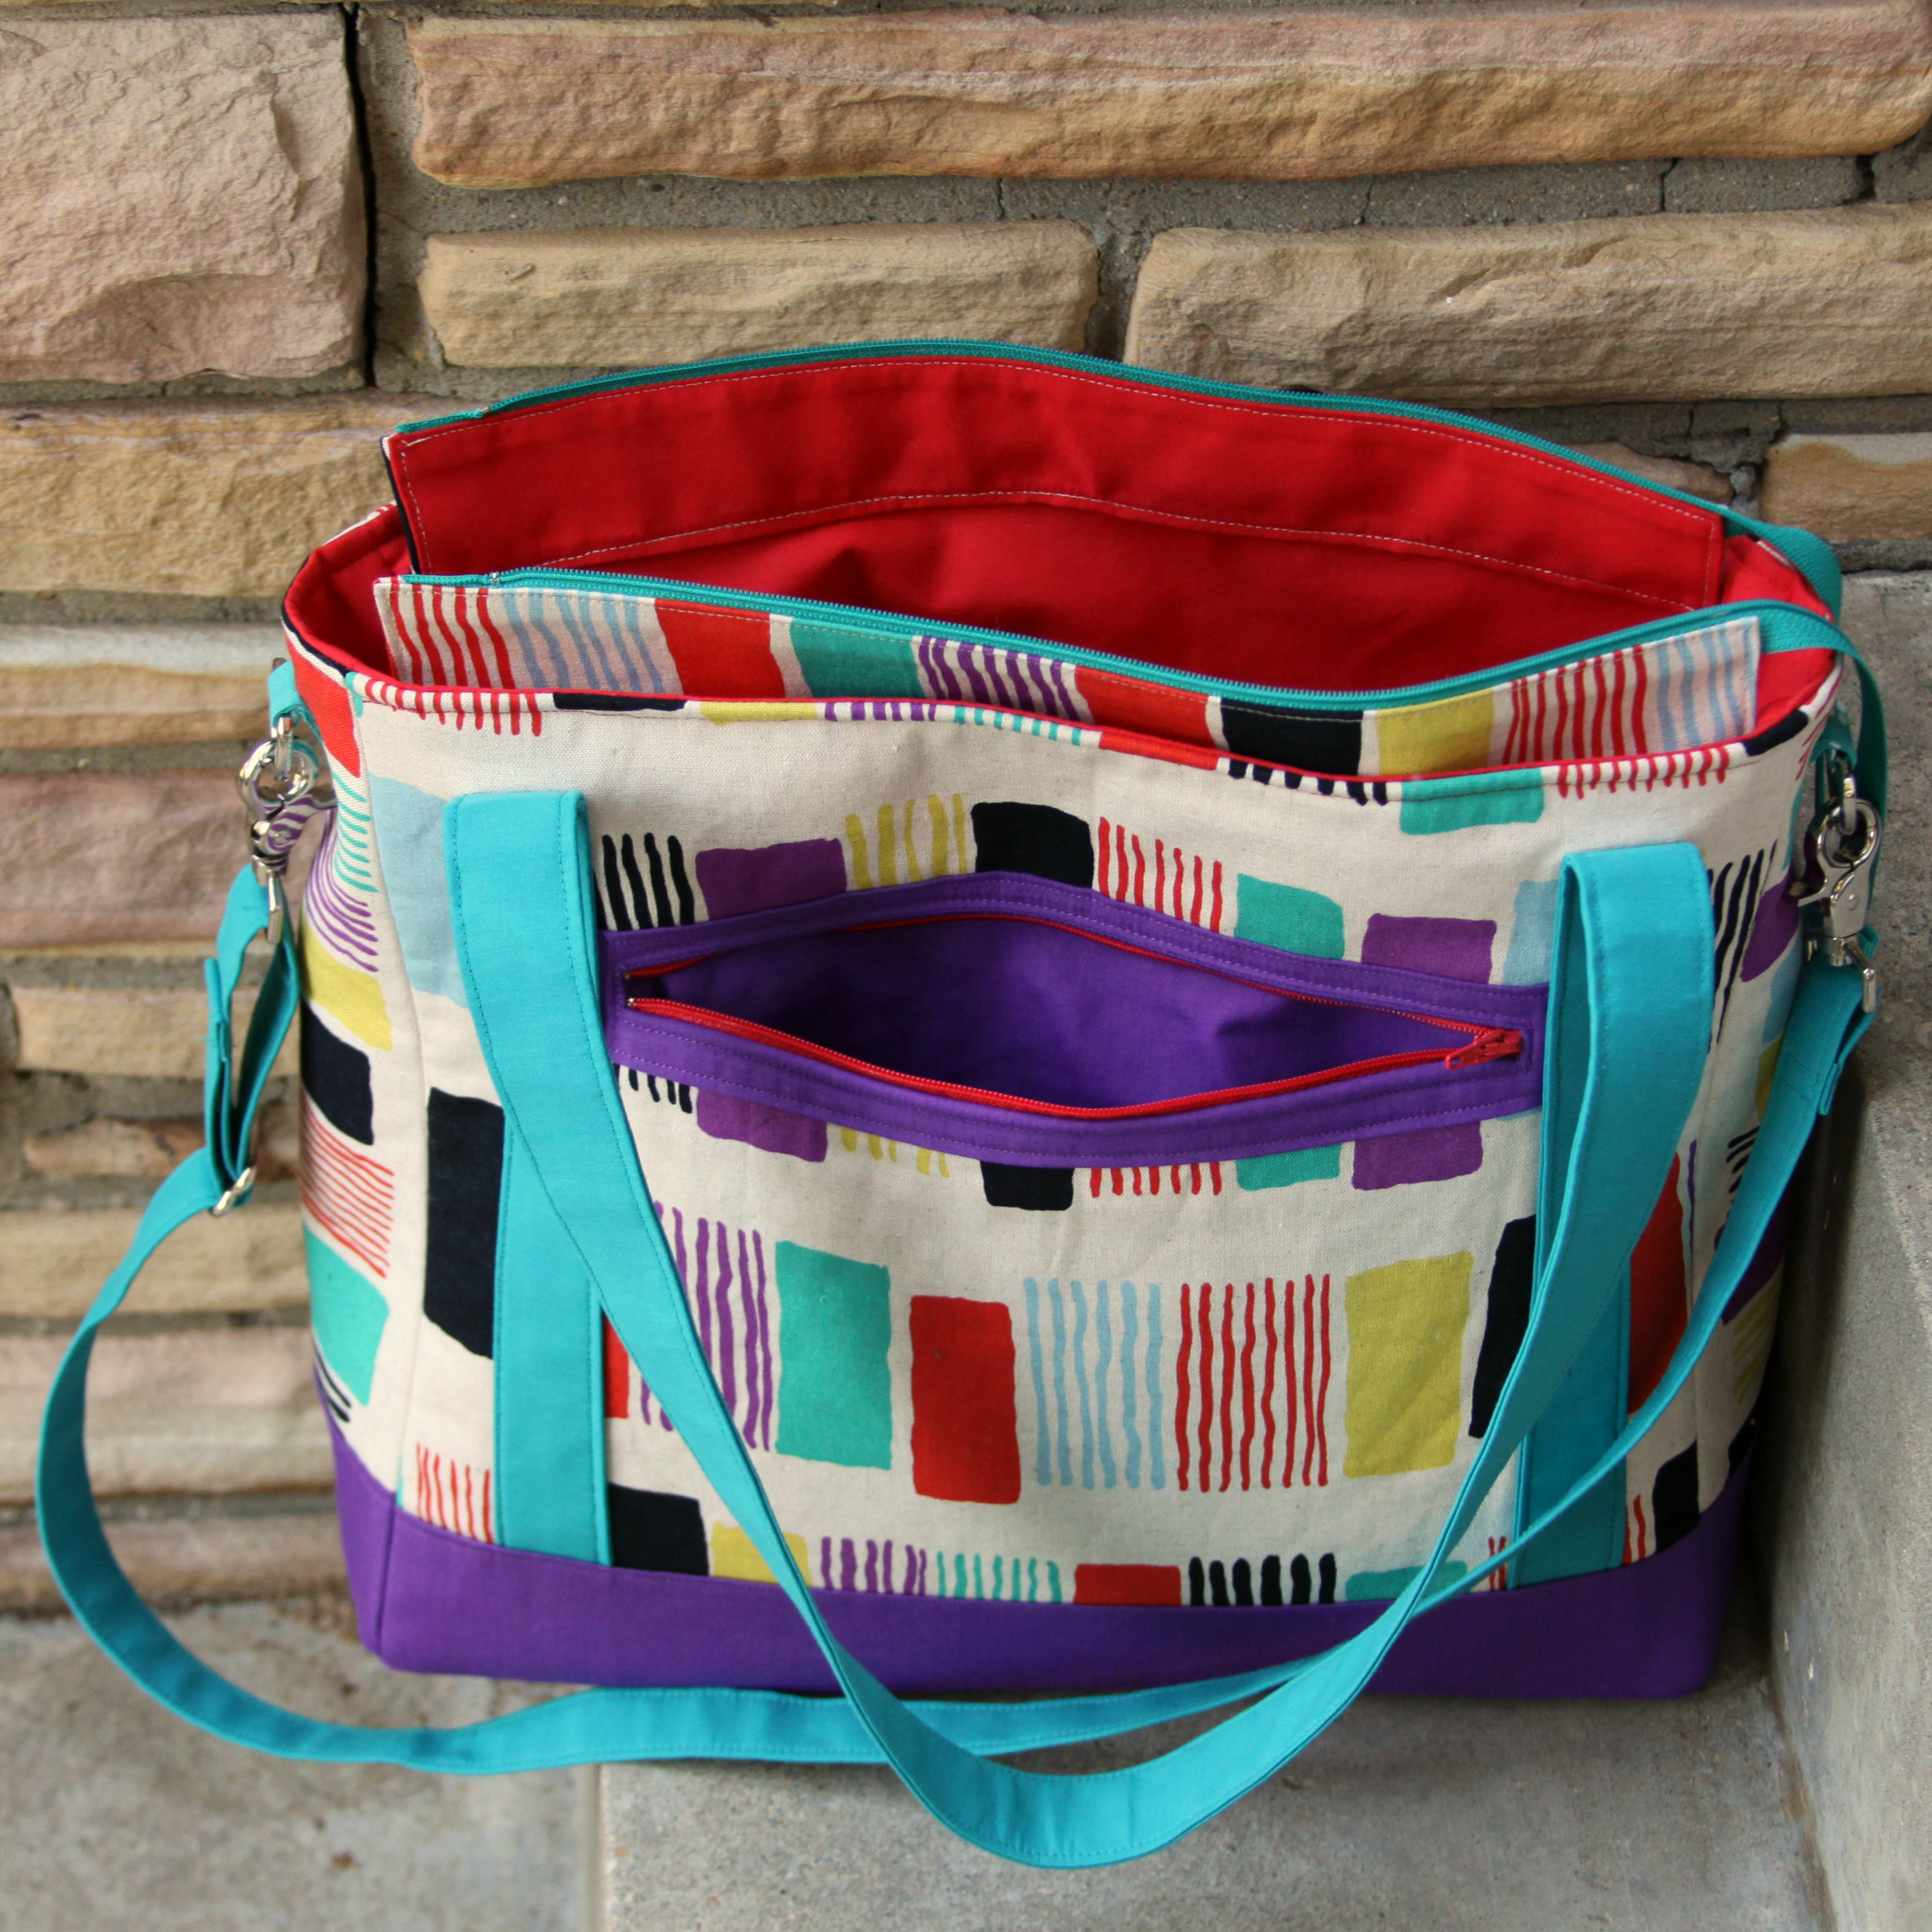 Tudor Bag by East Dakota Quilter - zipper